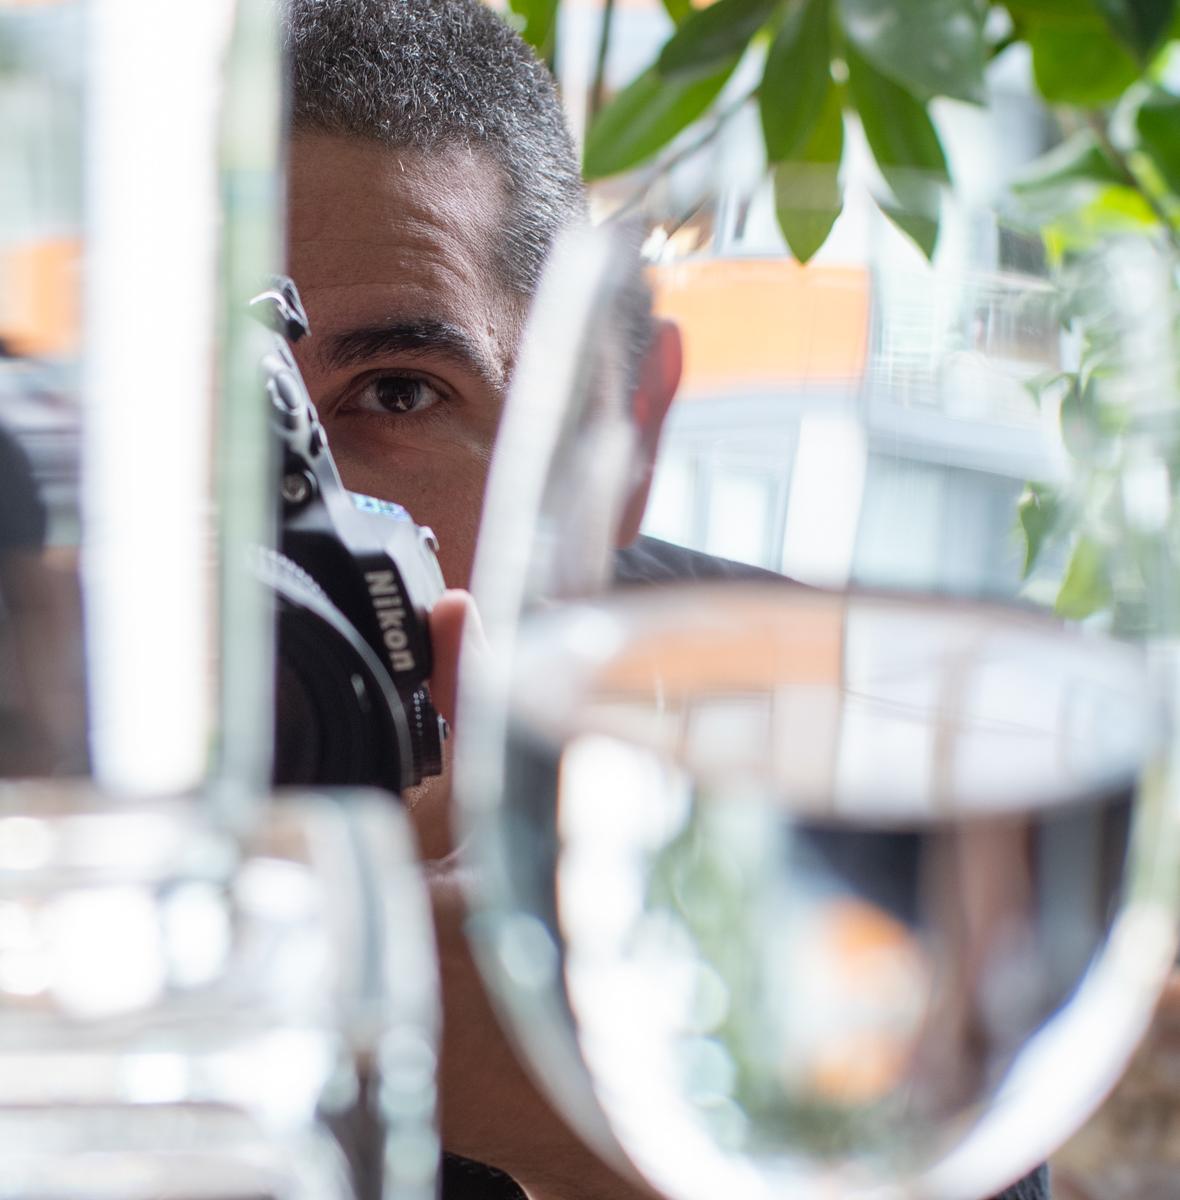 London-photographer-JC-Candanedo-Grey-Pistachio-Fashion-Corporate-Portraits-Headshots-Blog-Creative-Industry-London-sustainable-environment-eco-friendly.jpg